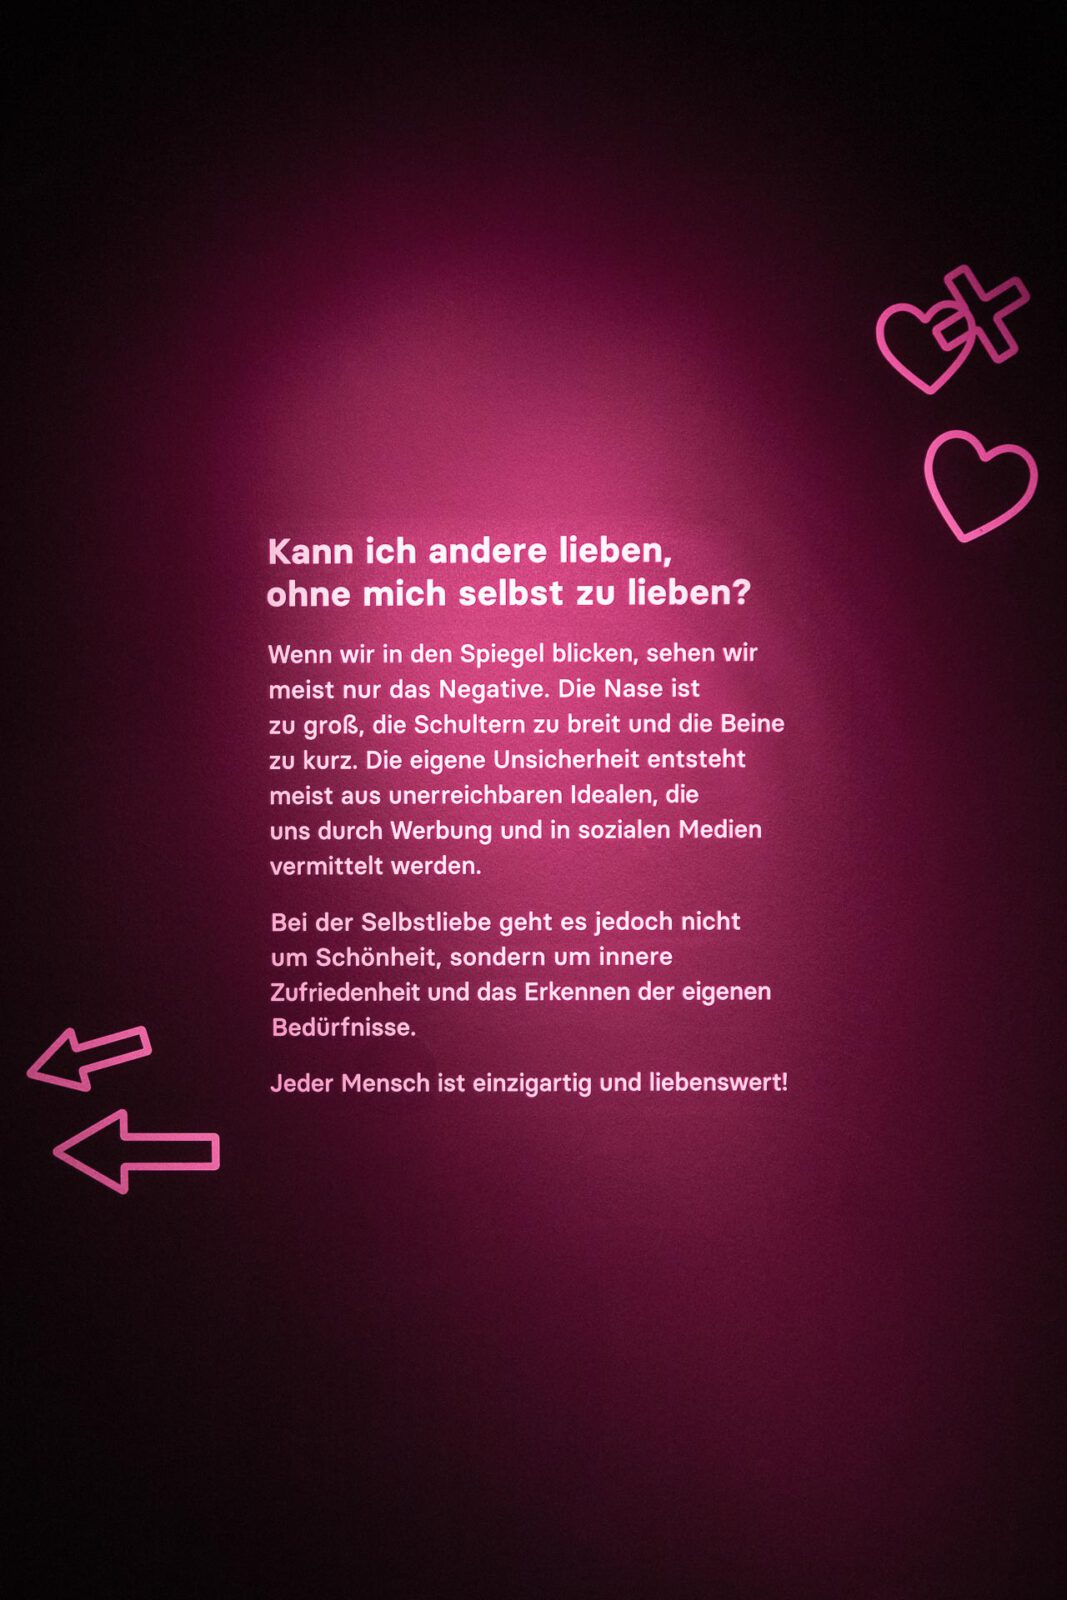 3_M_Bok_liebe_Freilichtmuseum-Detmold_08-05-2019_TE_6389